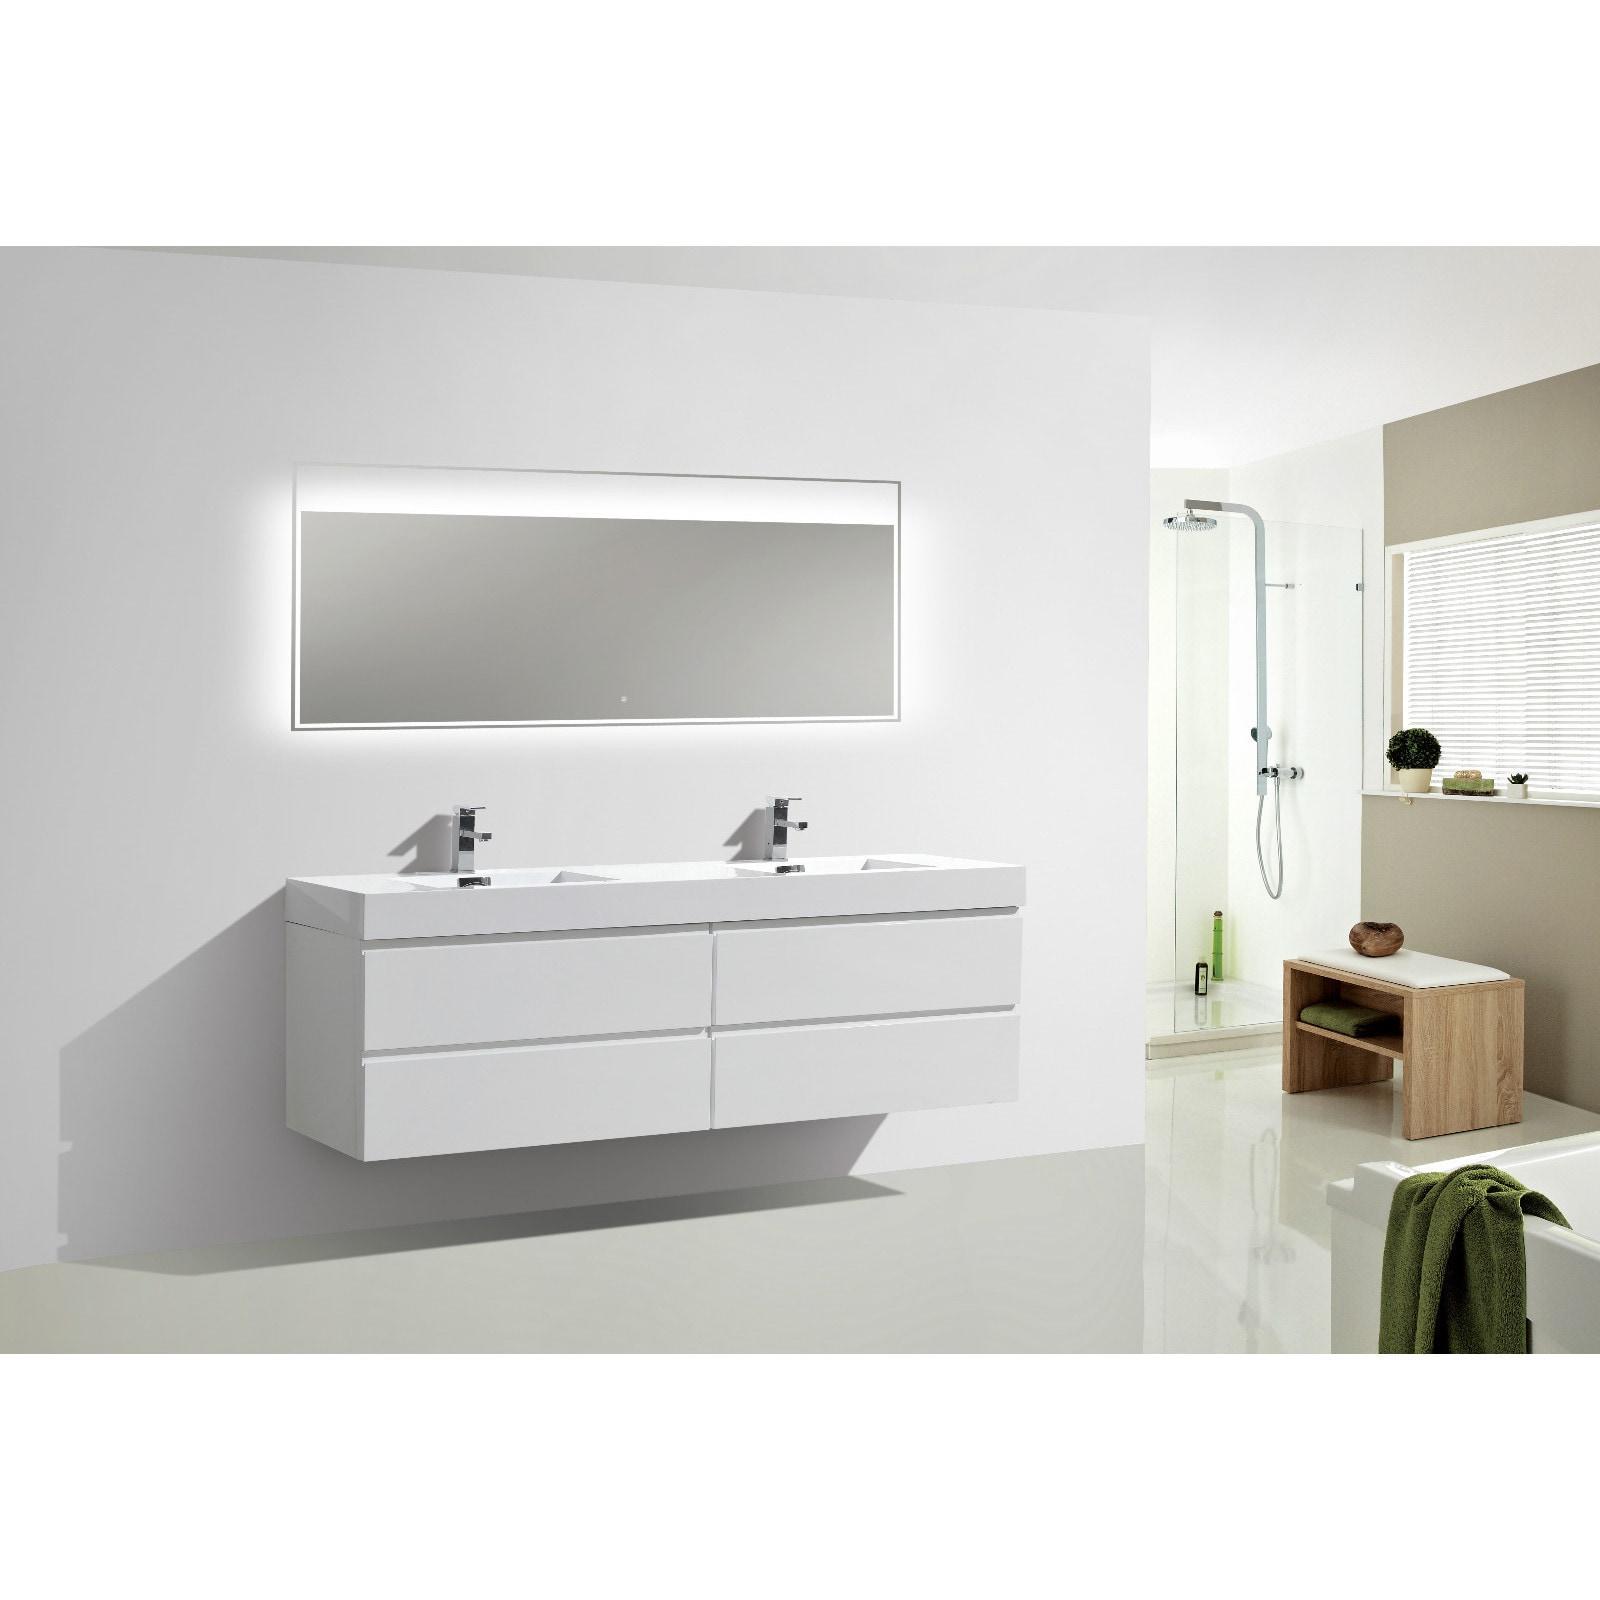 Shop Moreno Bath MOF 72 Inch Wall Mounted Modern Bathroom Vanity ...